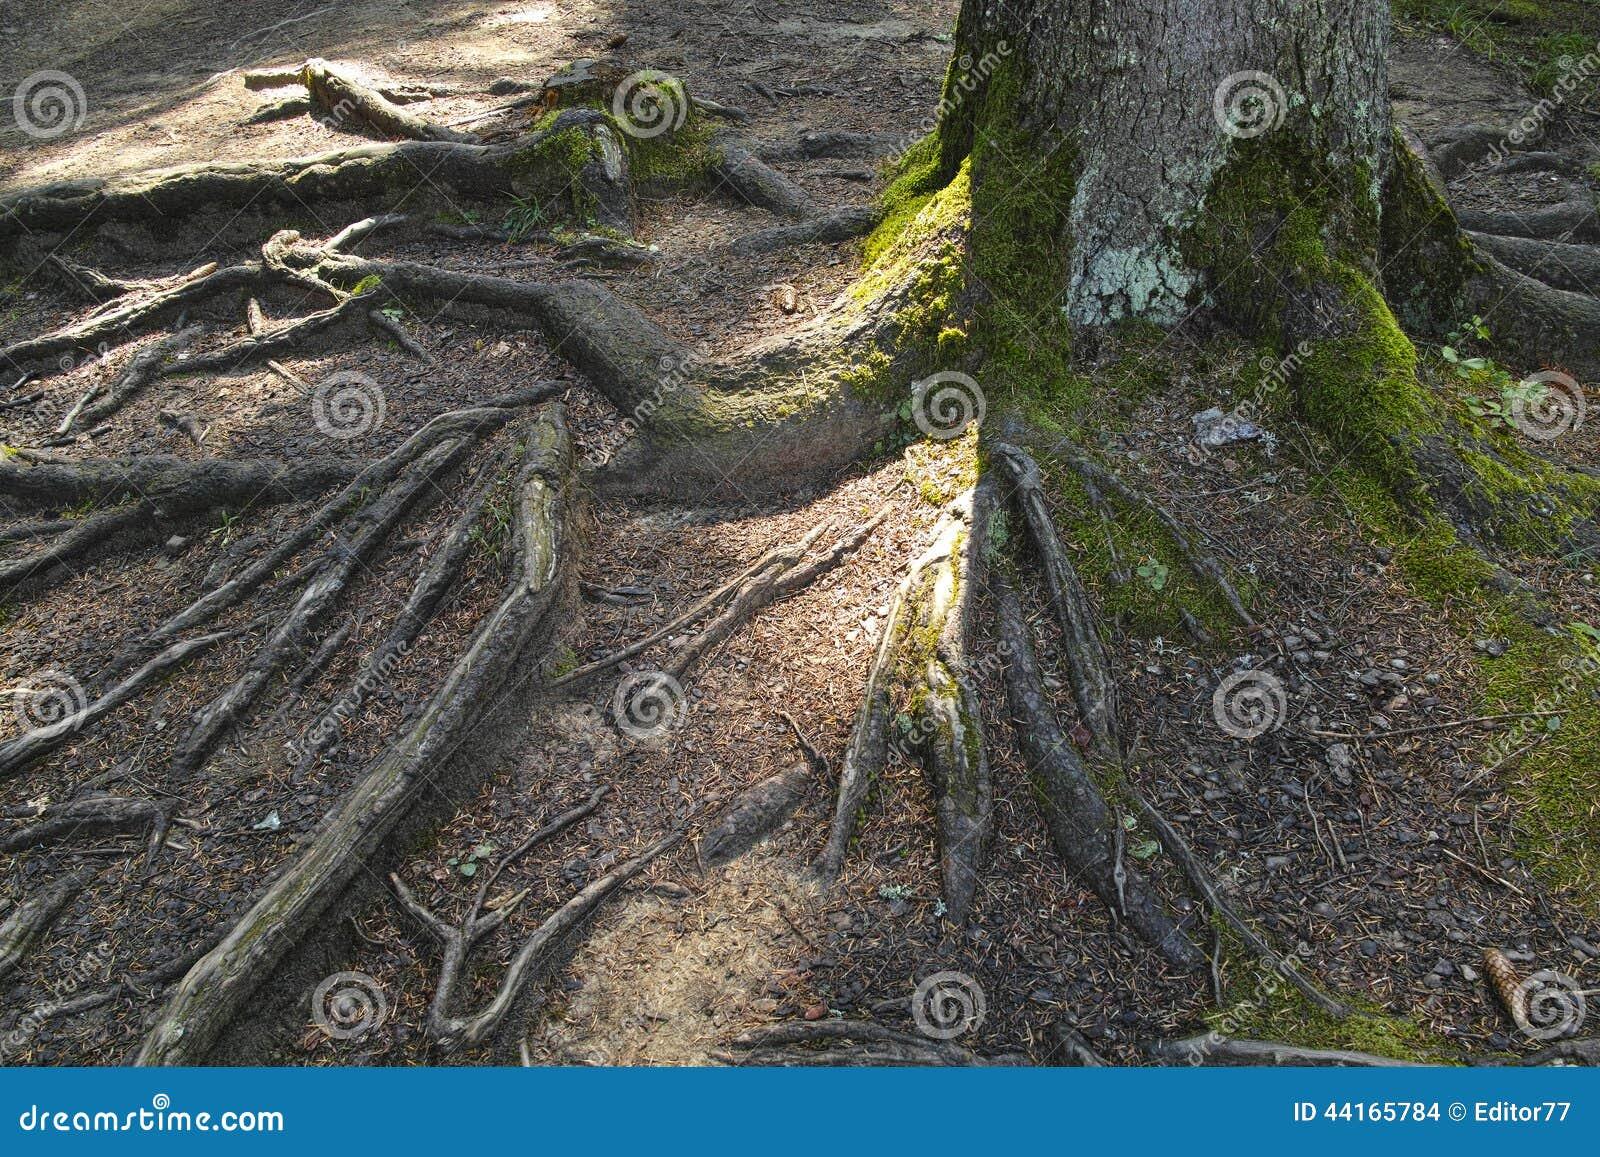 Racine d 39 arbre de sapin photo stock image du for t fond 44165784 - Sapin de noel avec racine ...